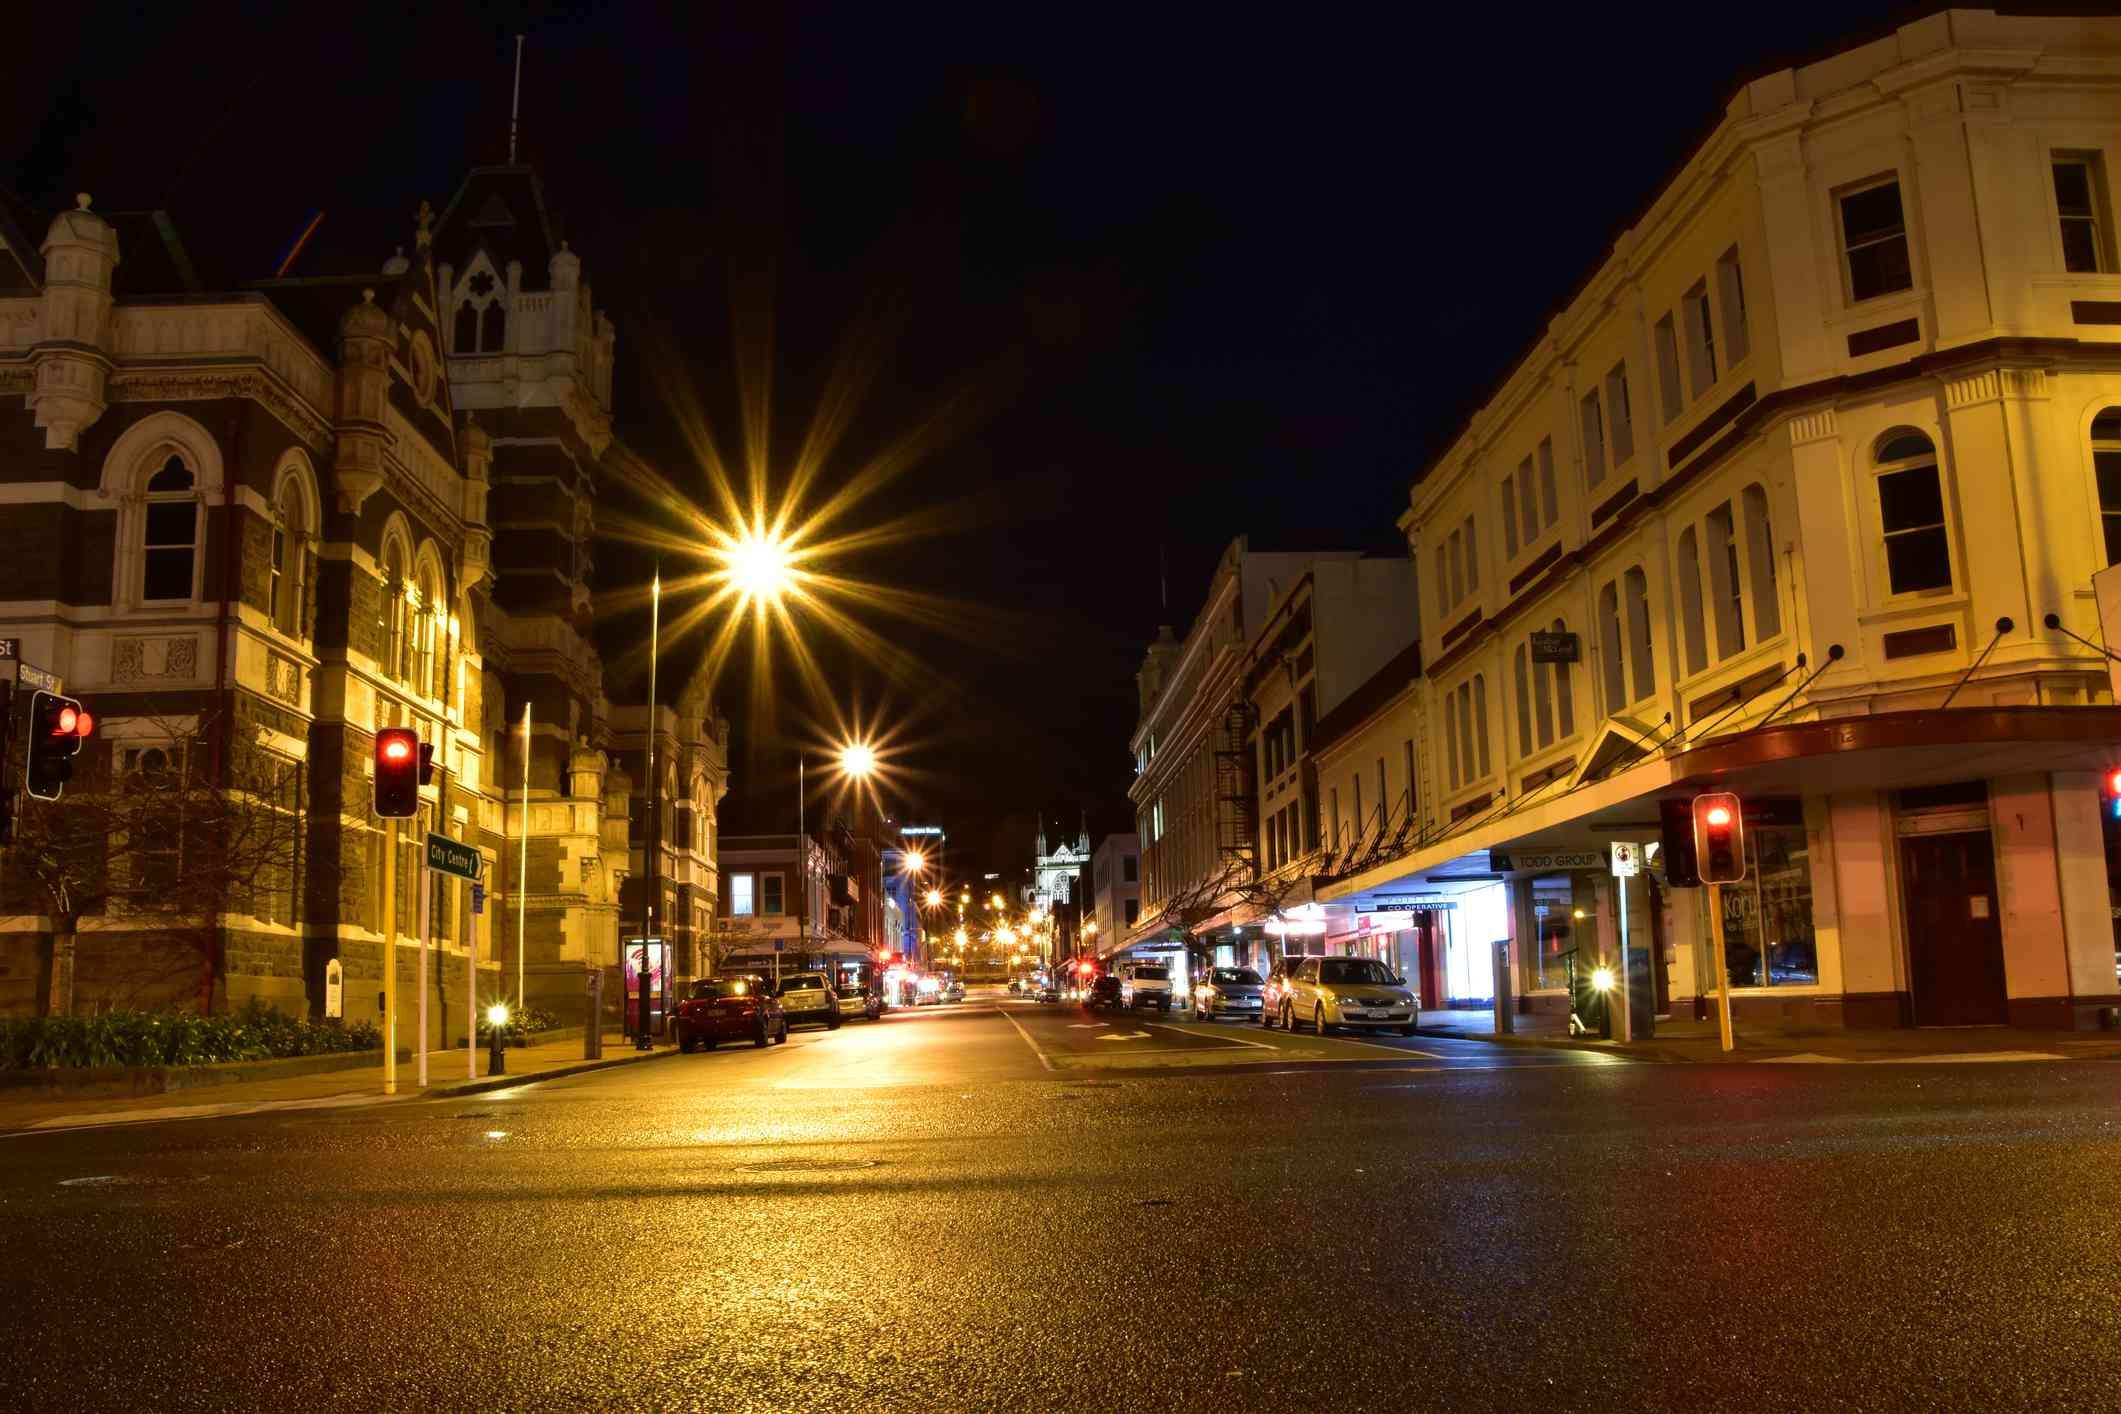 street scene of central Dunedin city at night